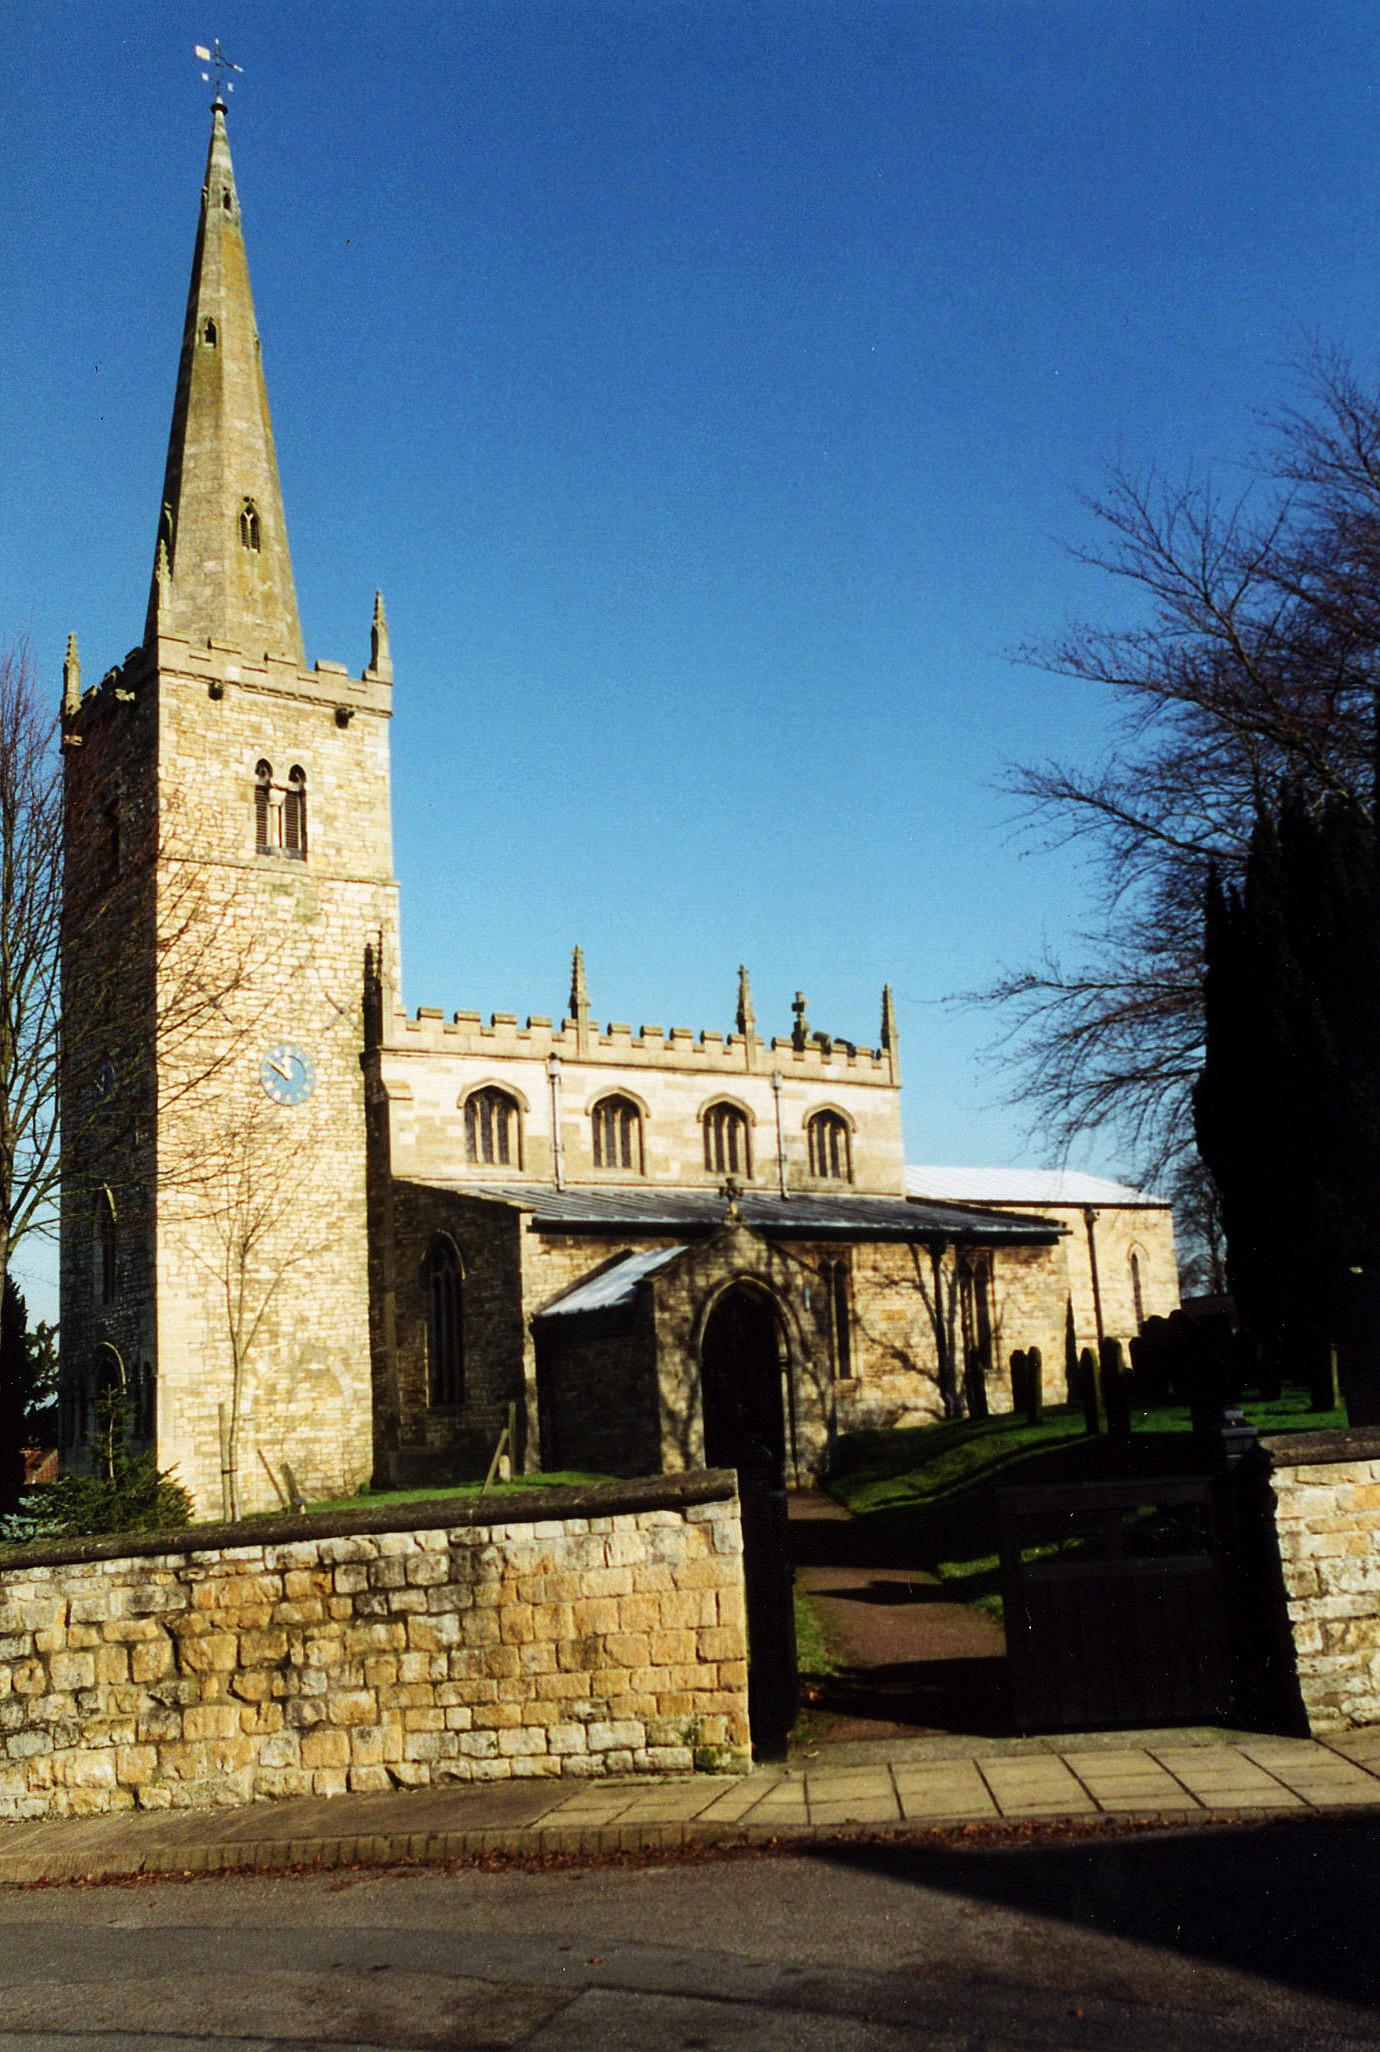 Branston All Saints Church